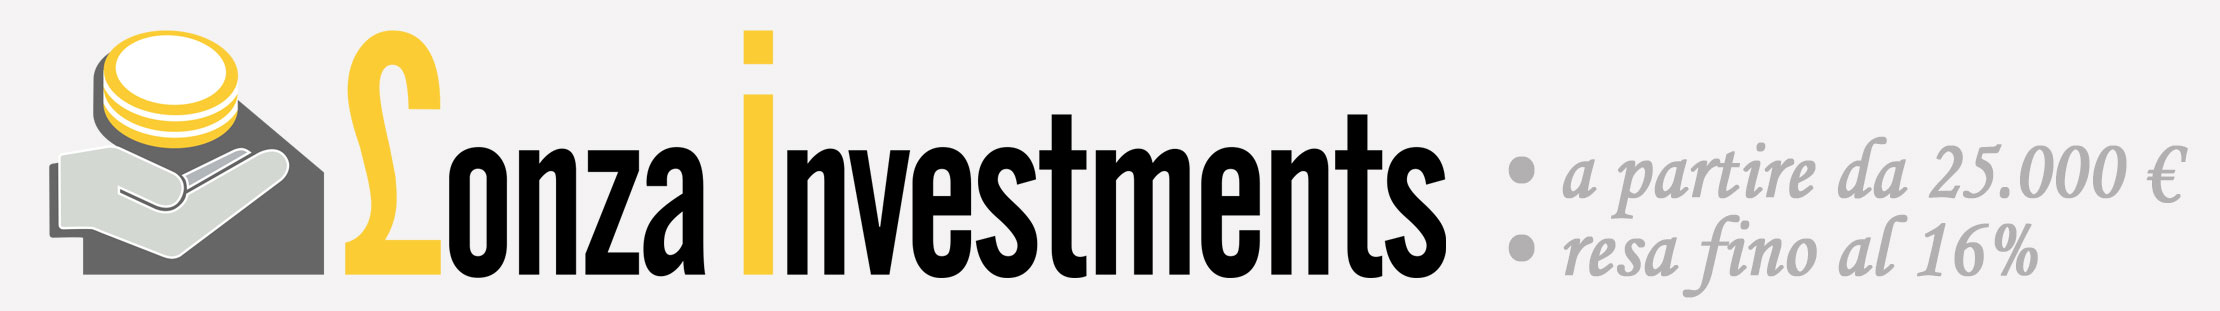 Lonza Investments - investimenti alta rendita